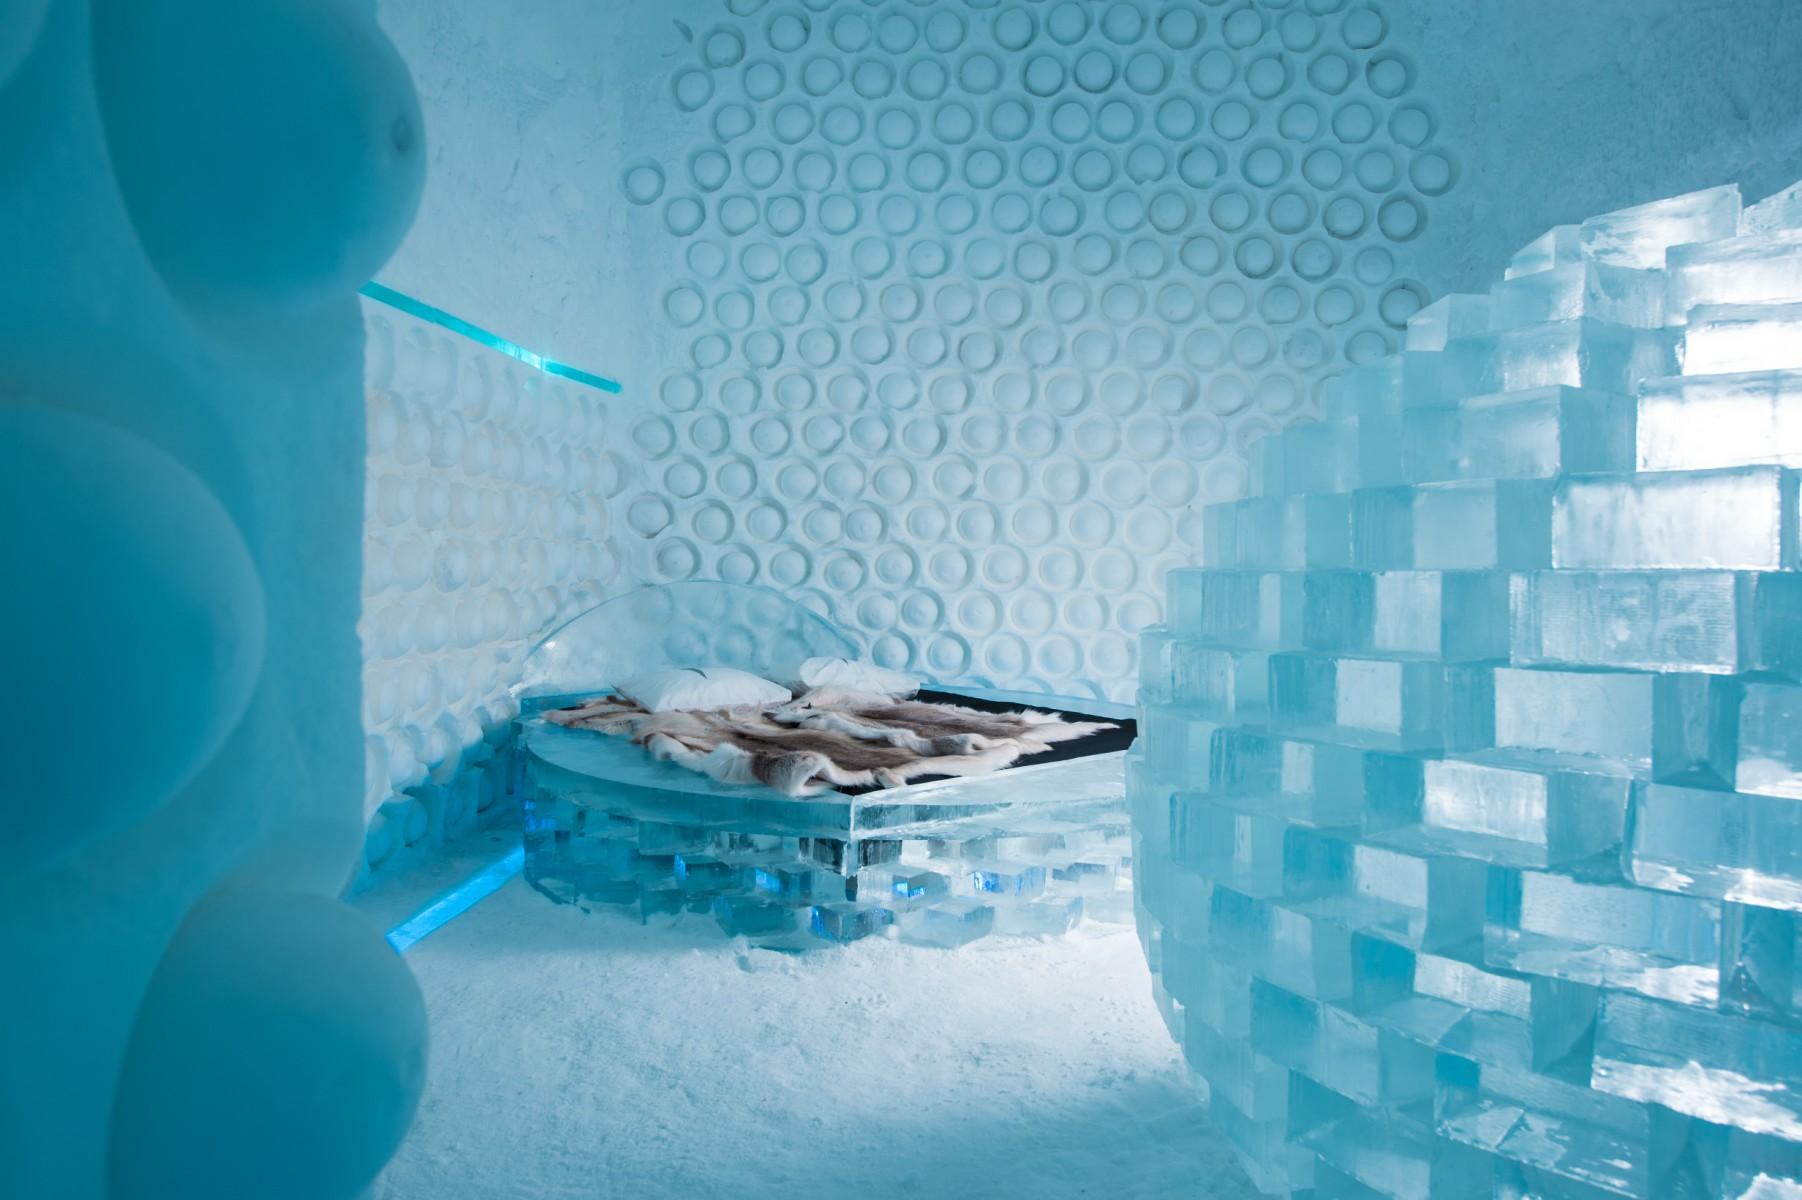 Presenta 5 Dei Pi Incredibili Igloo Ice